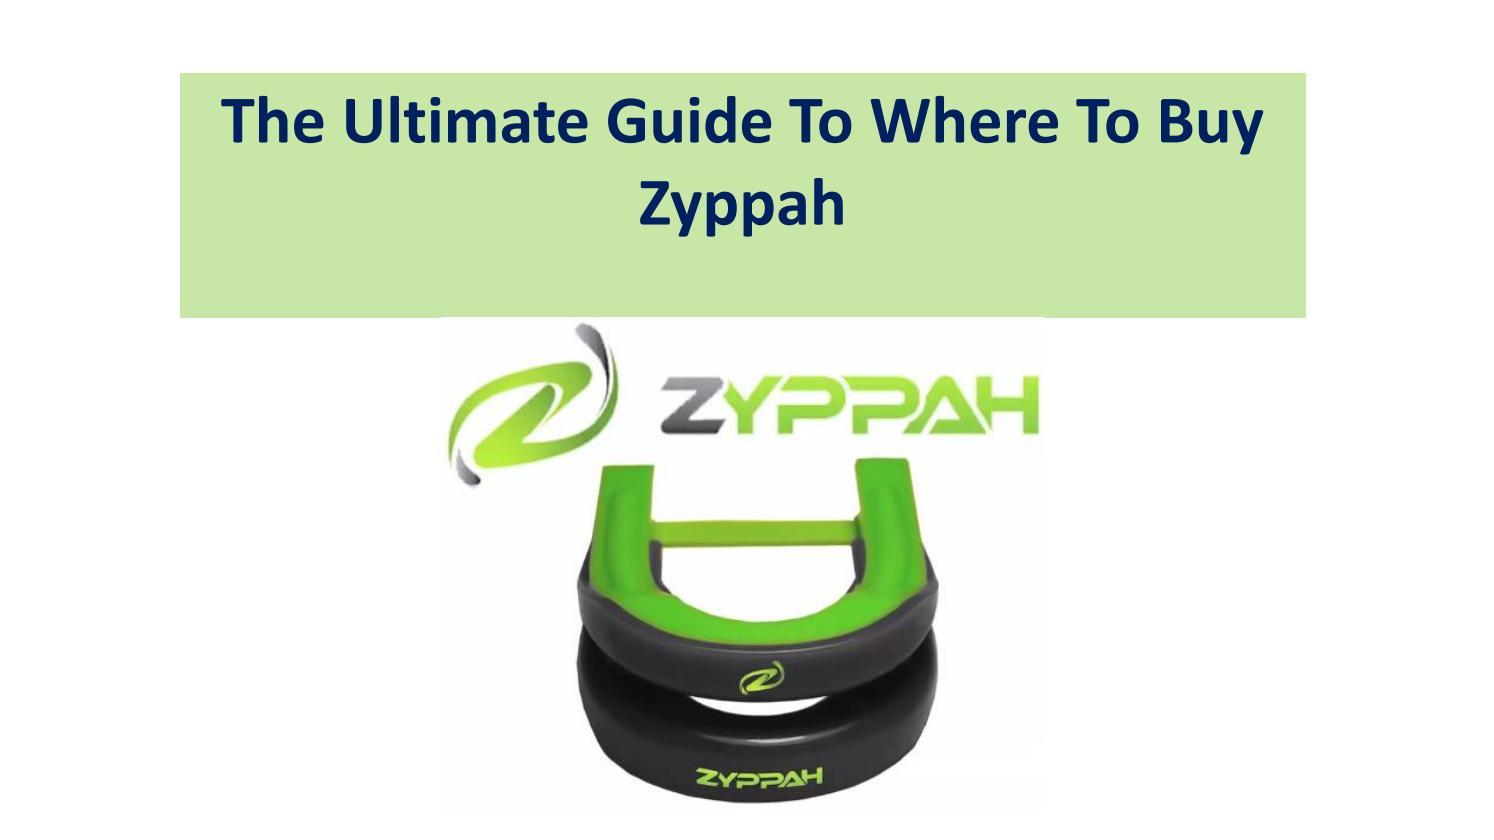 Where to buy zyppah - fightsnoring net